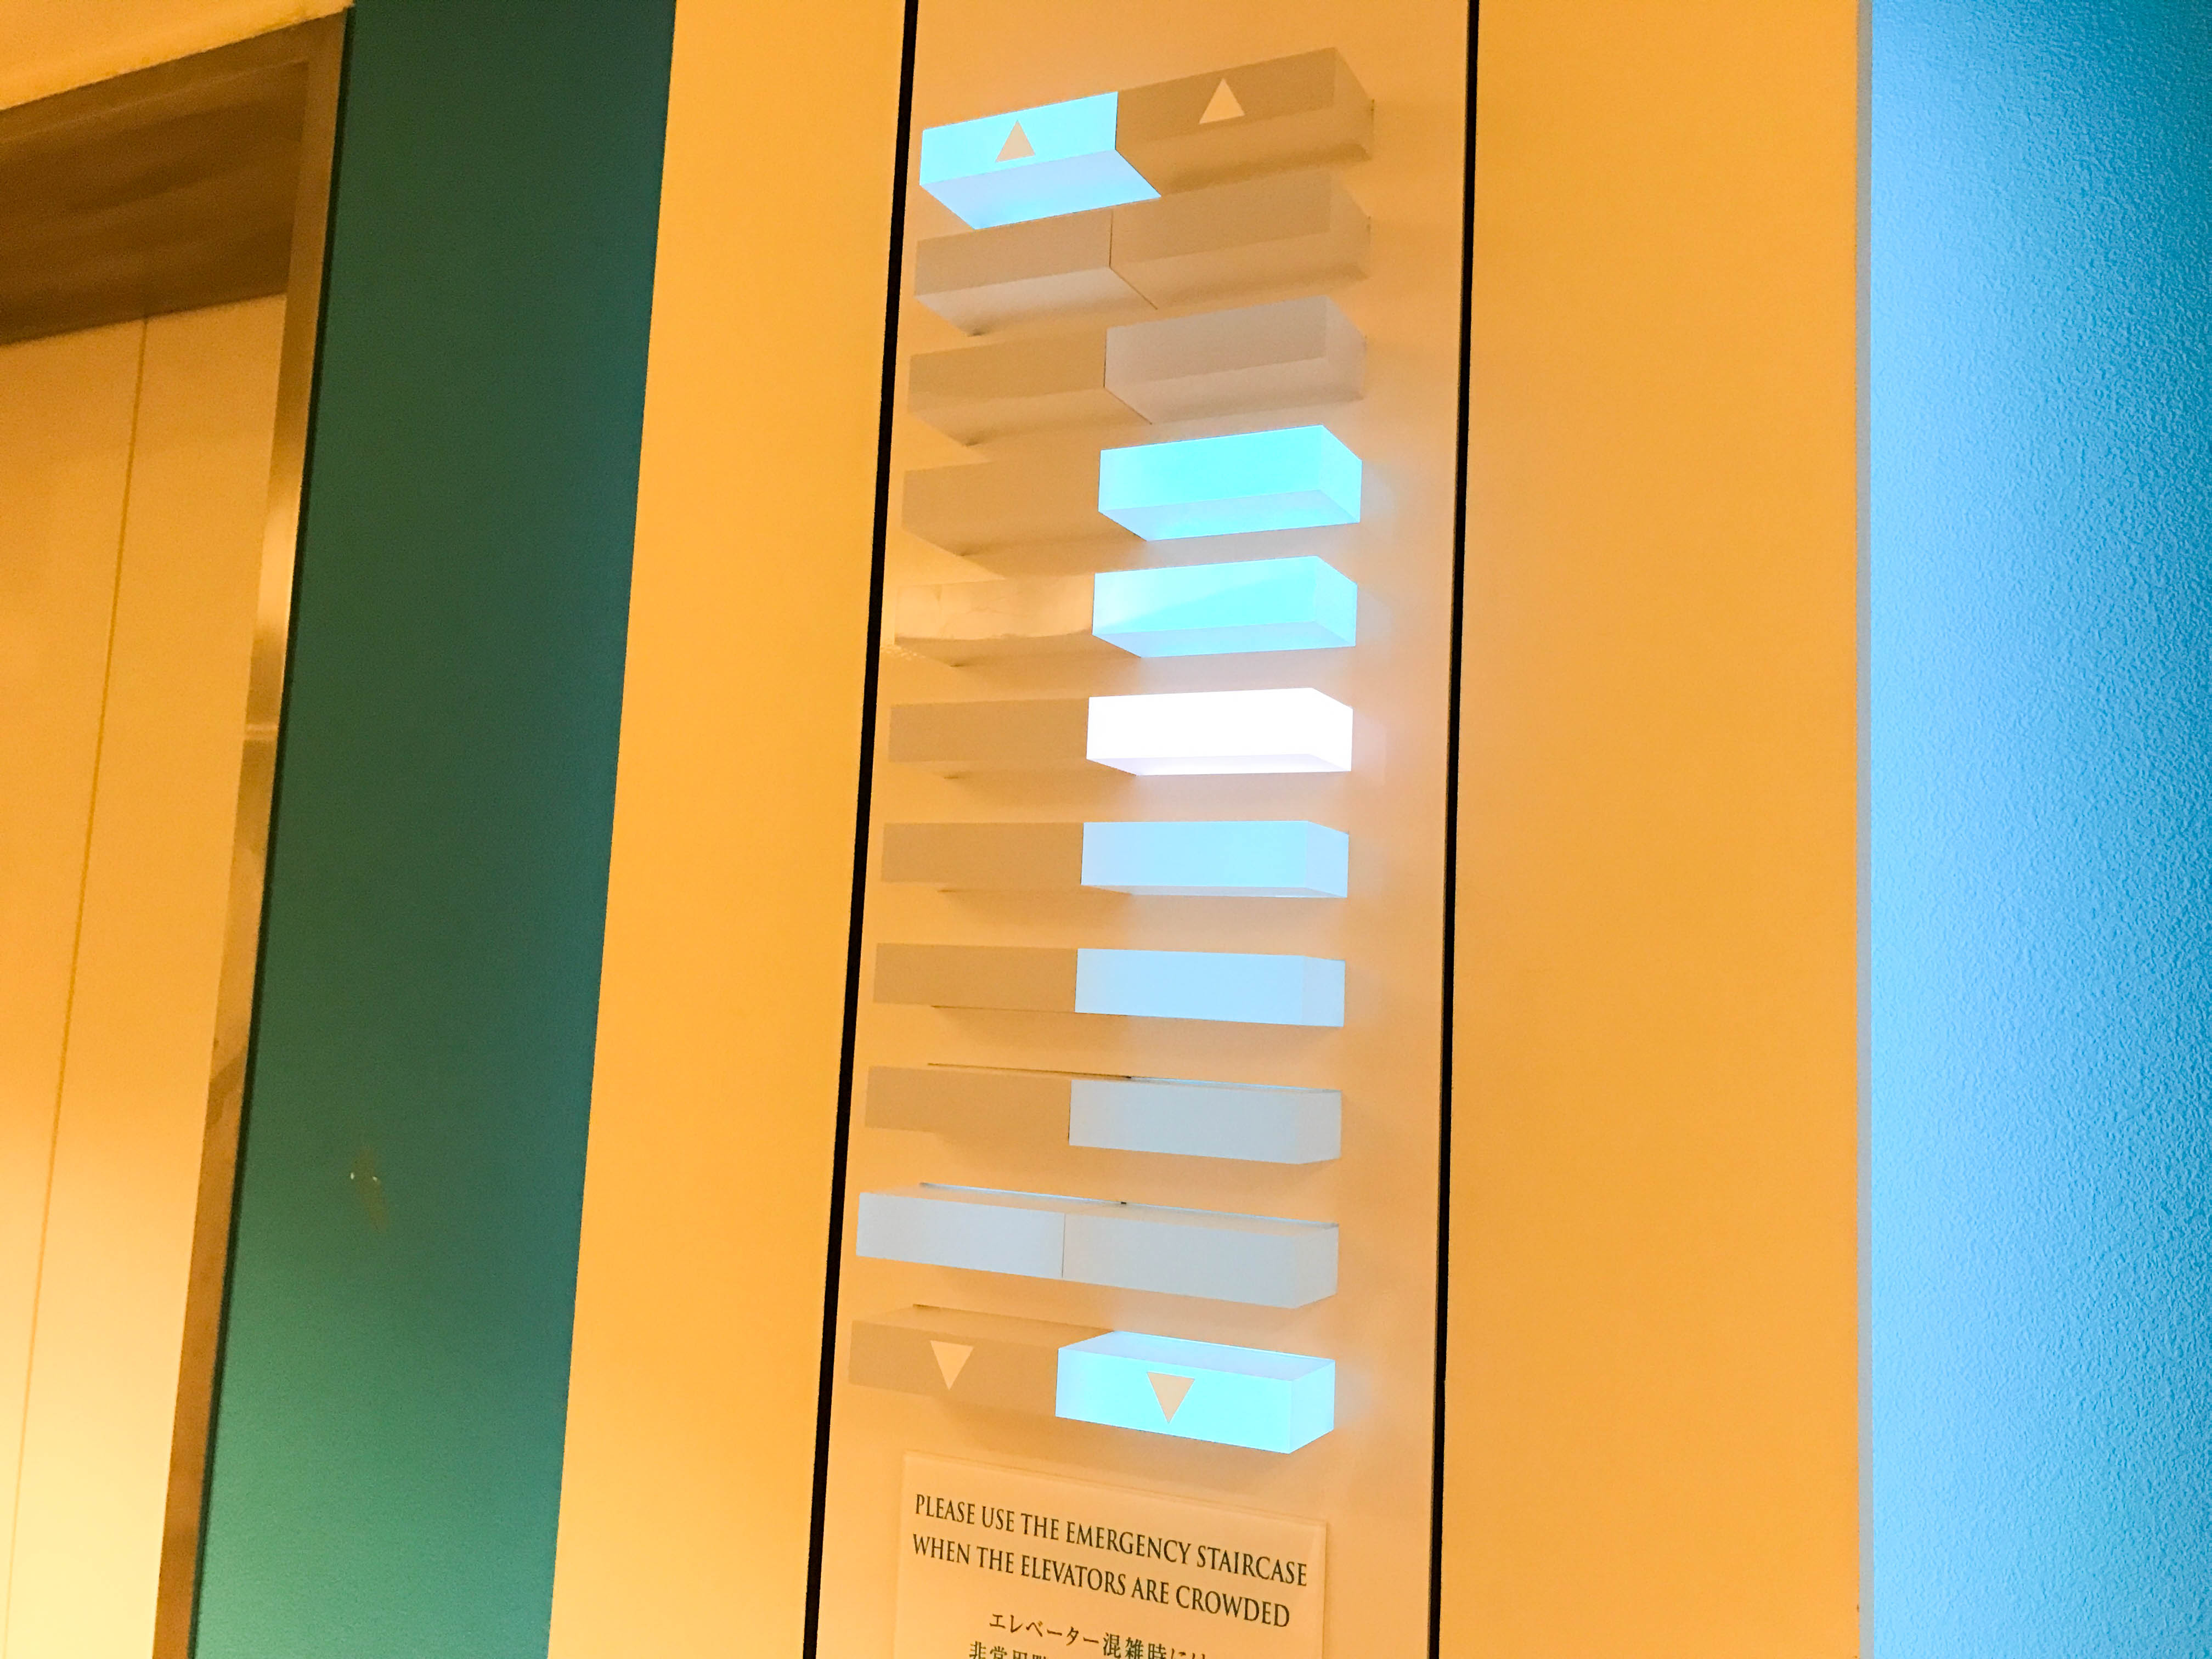 ANAインターコンチネンタル万座ビーチリゾートのエレベータ